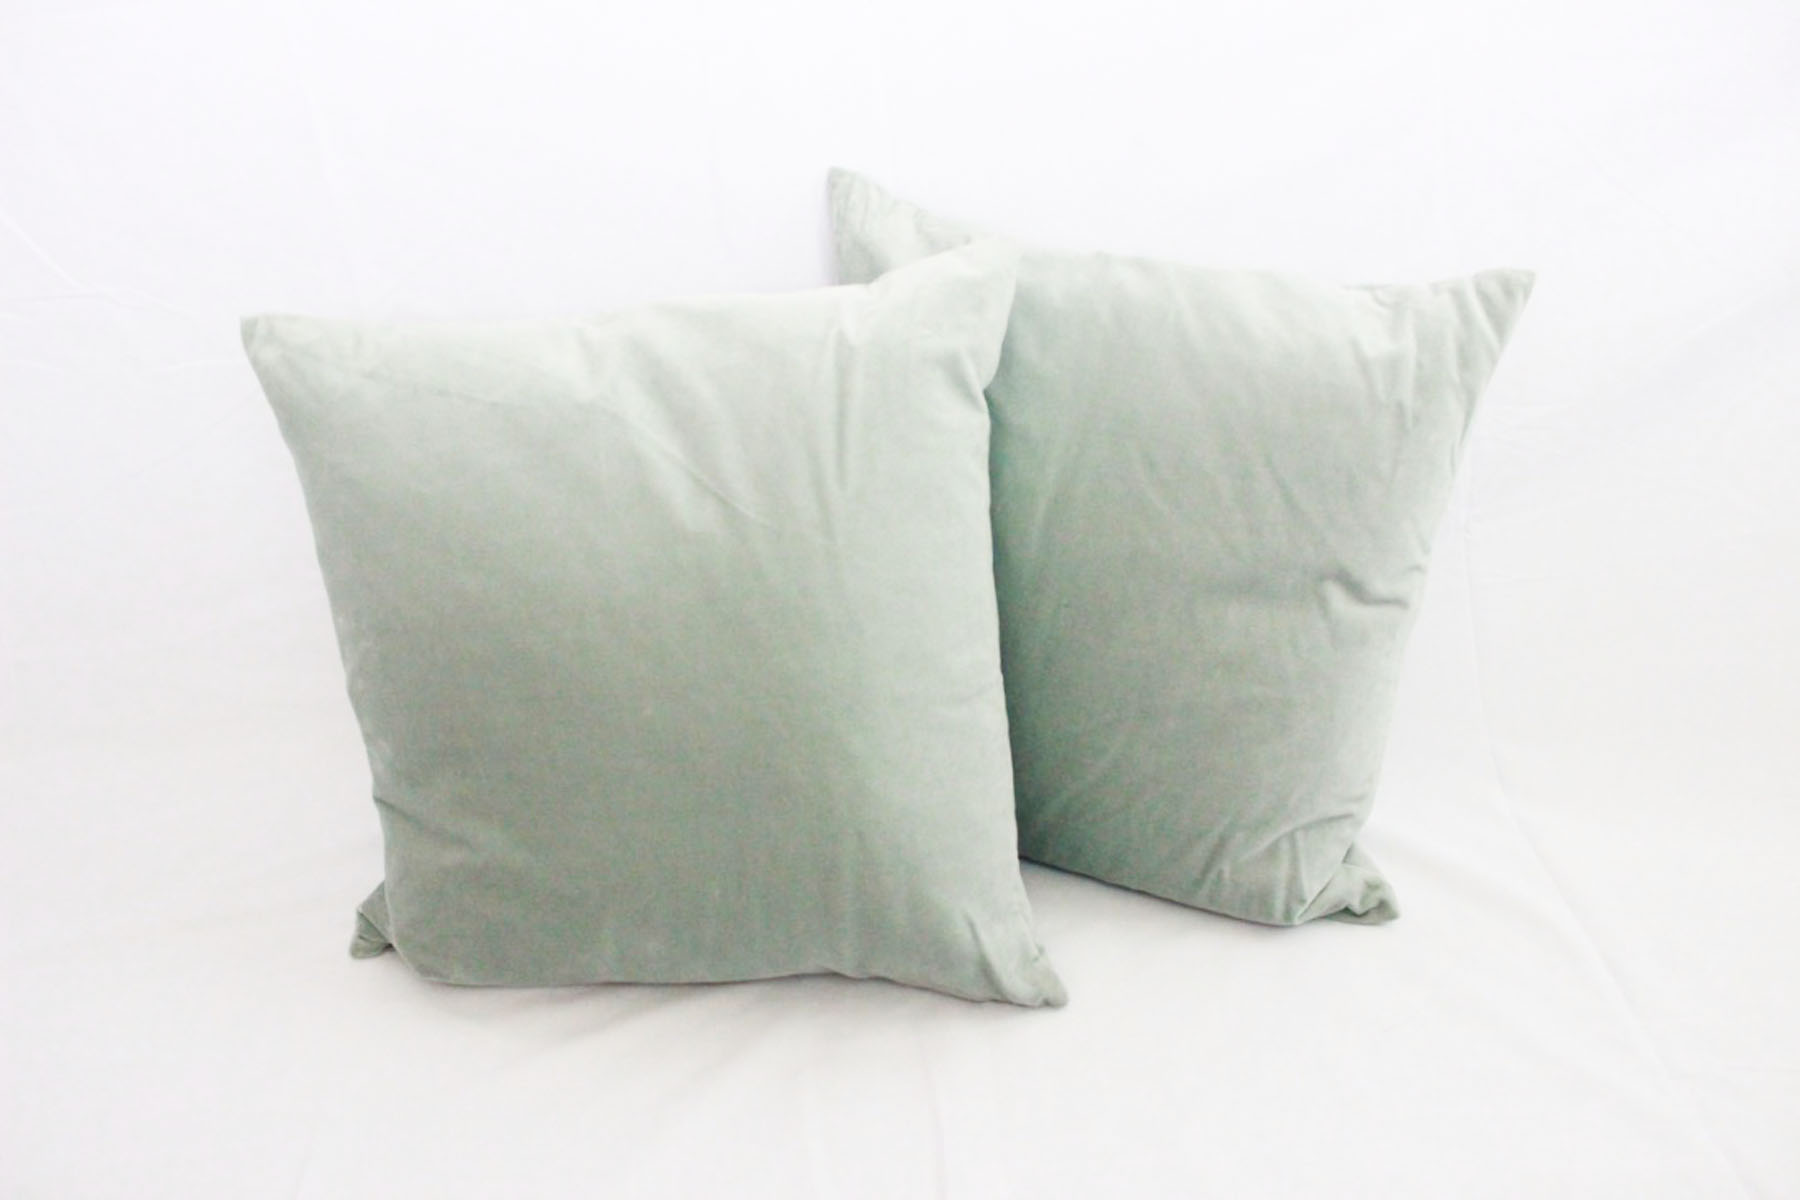 Pale Blue Velvet Pillows - Scavenged Vintage